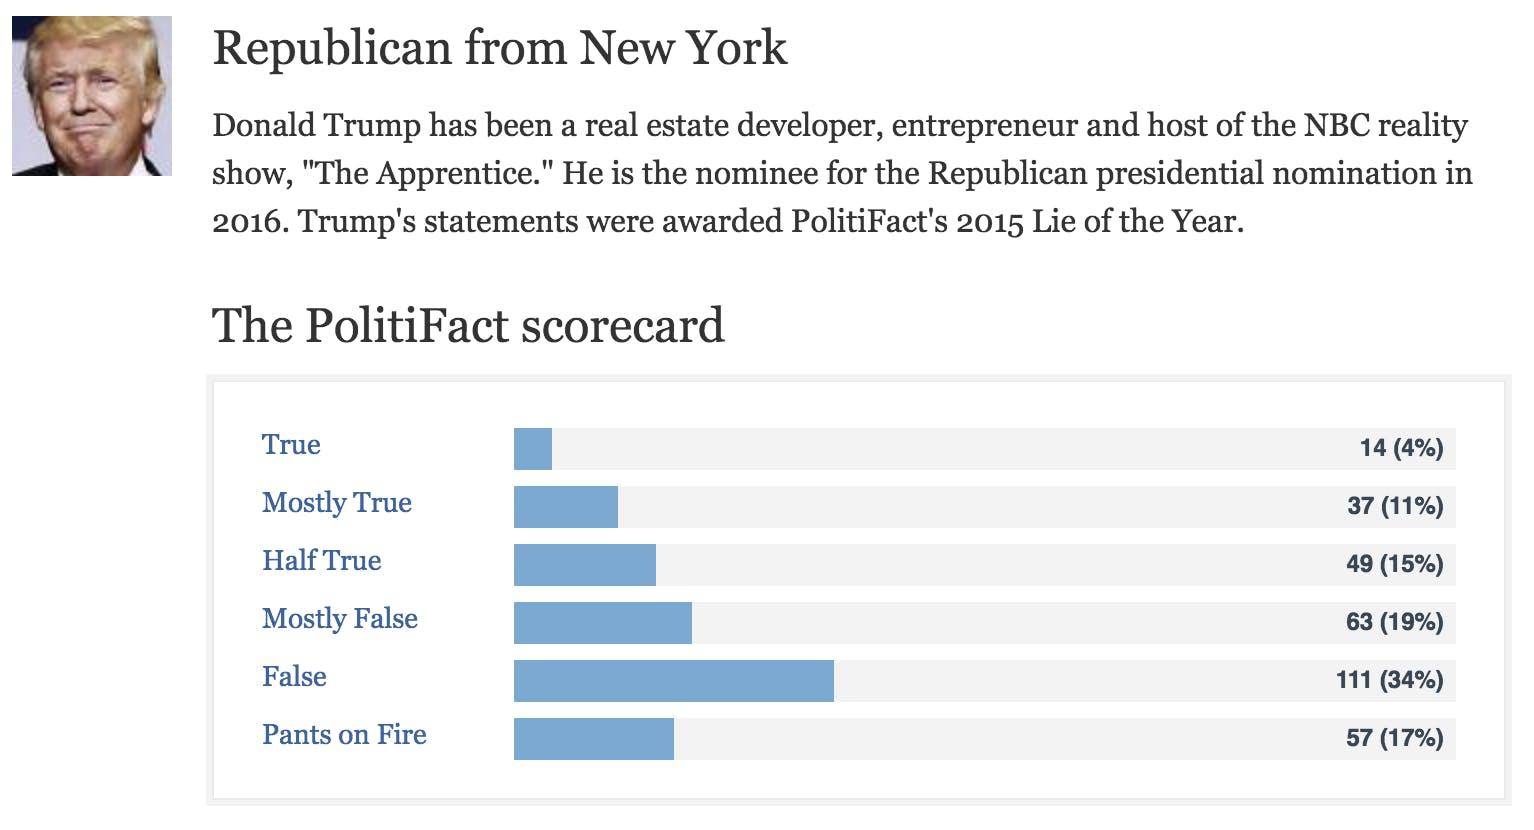 Why do people hate Trump? His PolitiFact scorecard